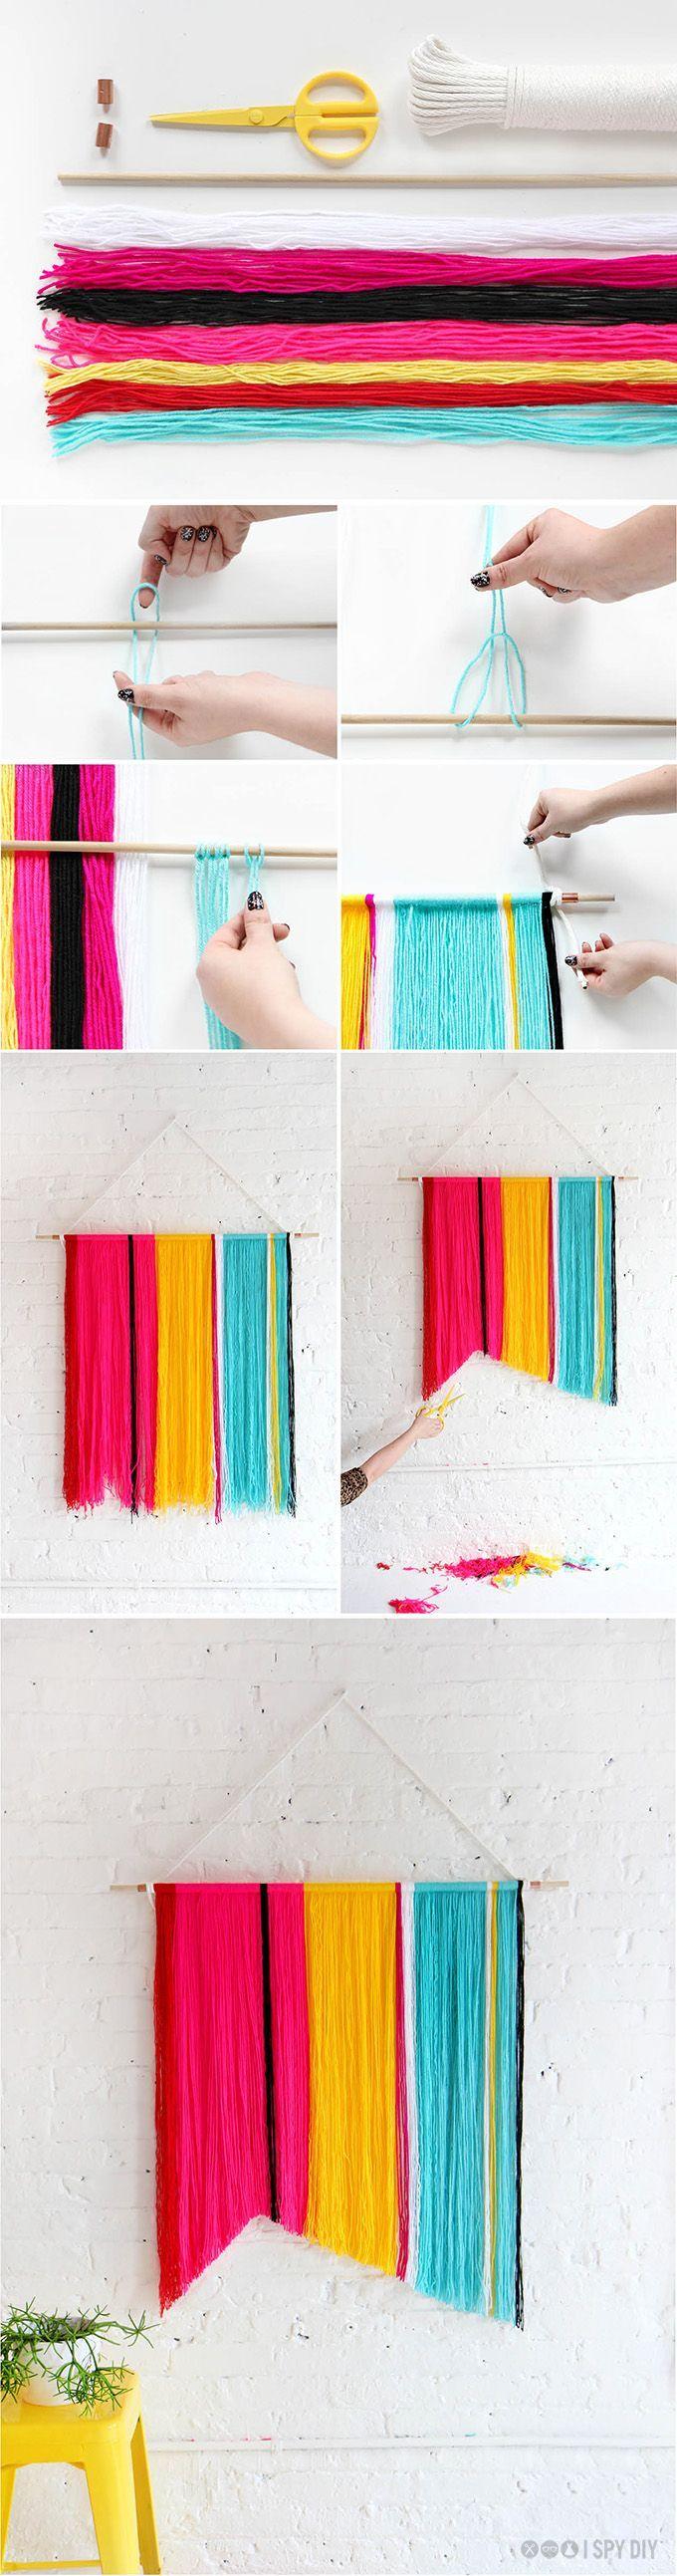 DIY: Yarn Wall Handing